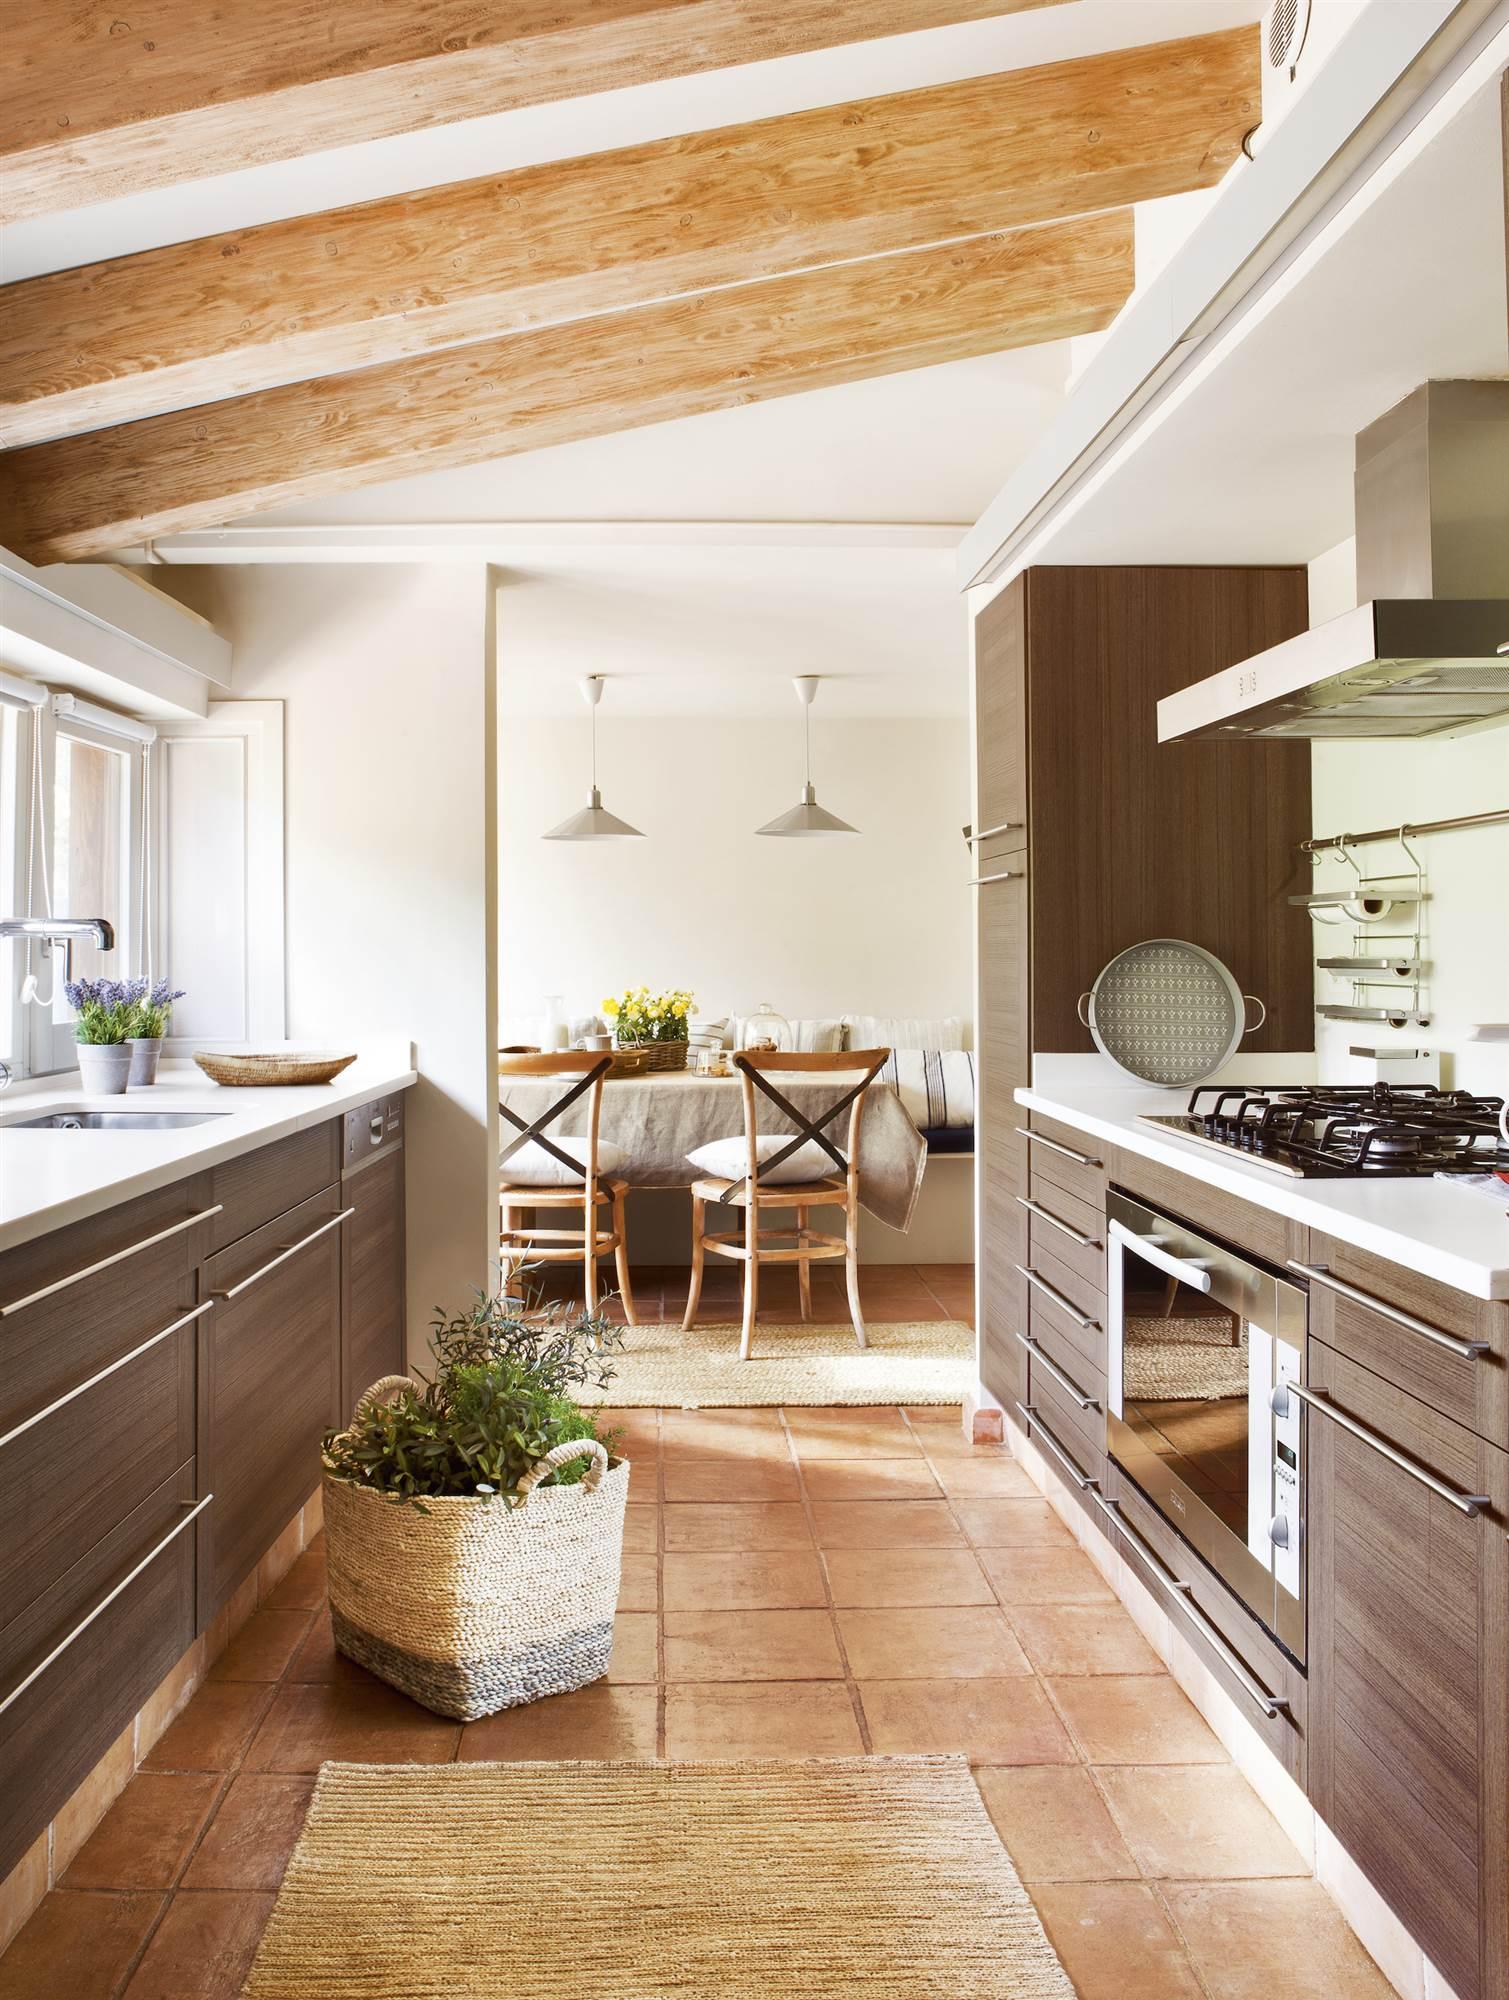 2147 fotos de cocinas - Cocina de madera ...